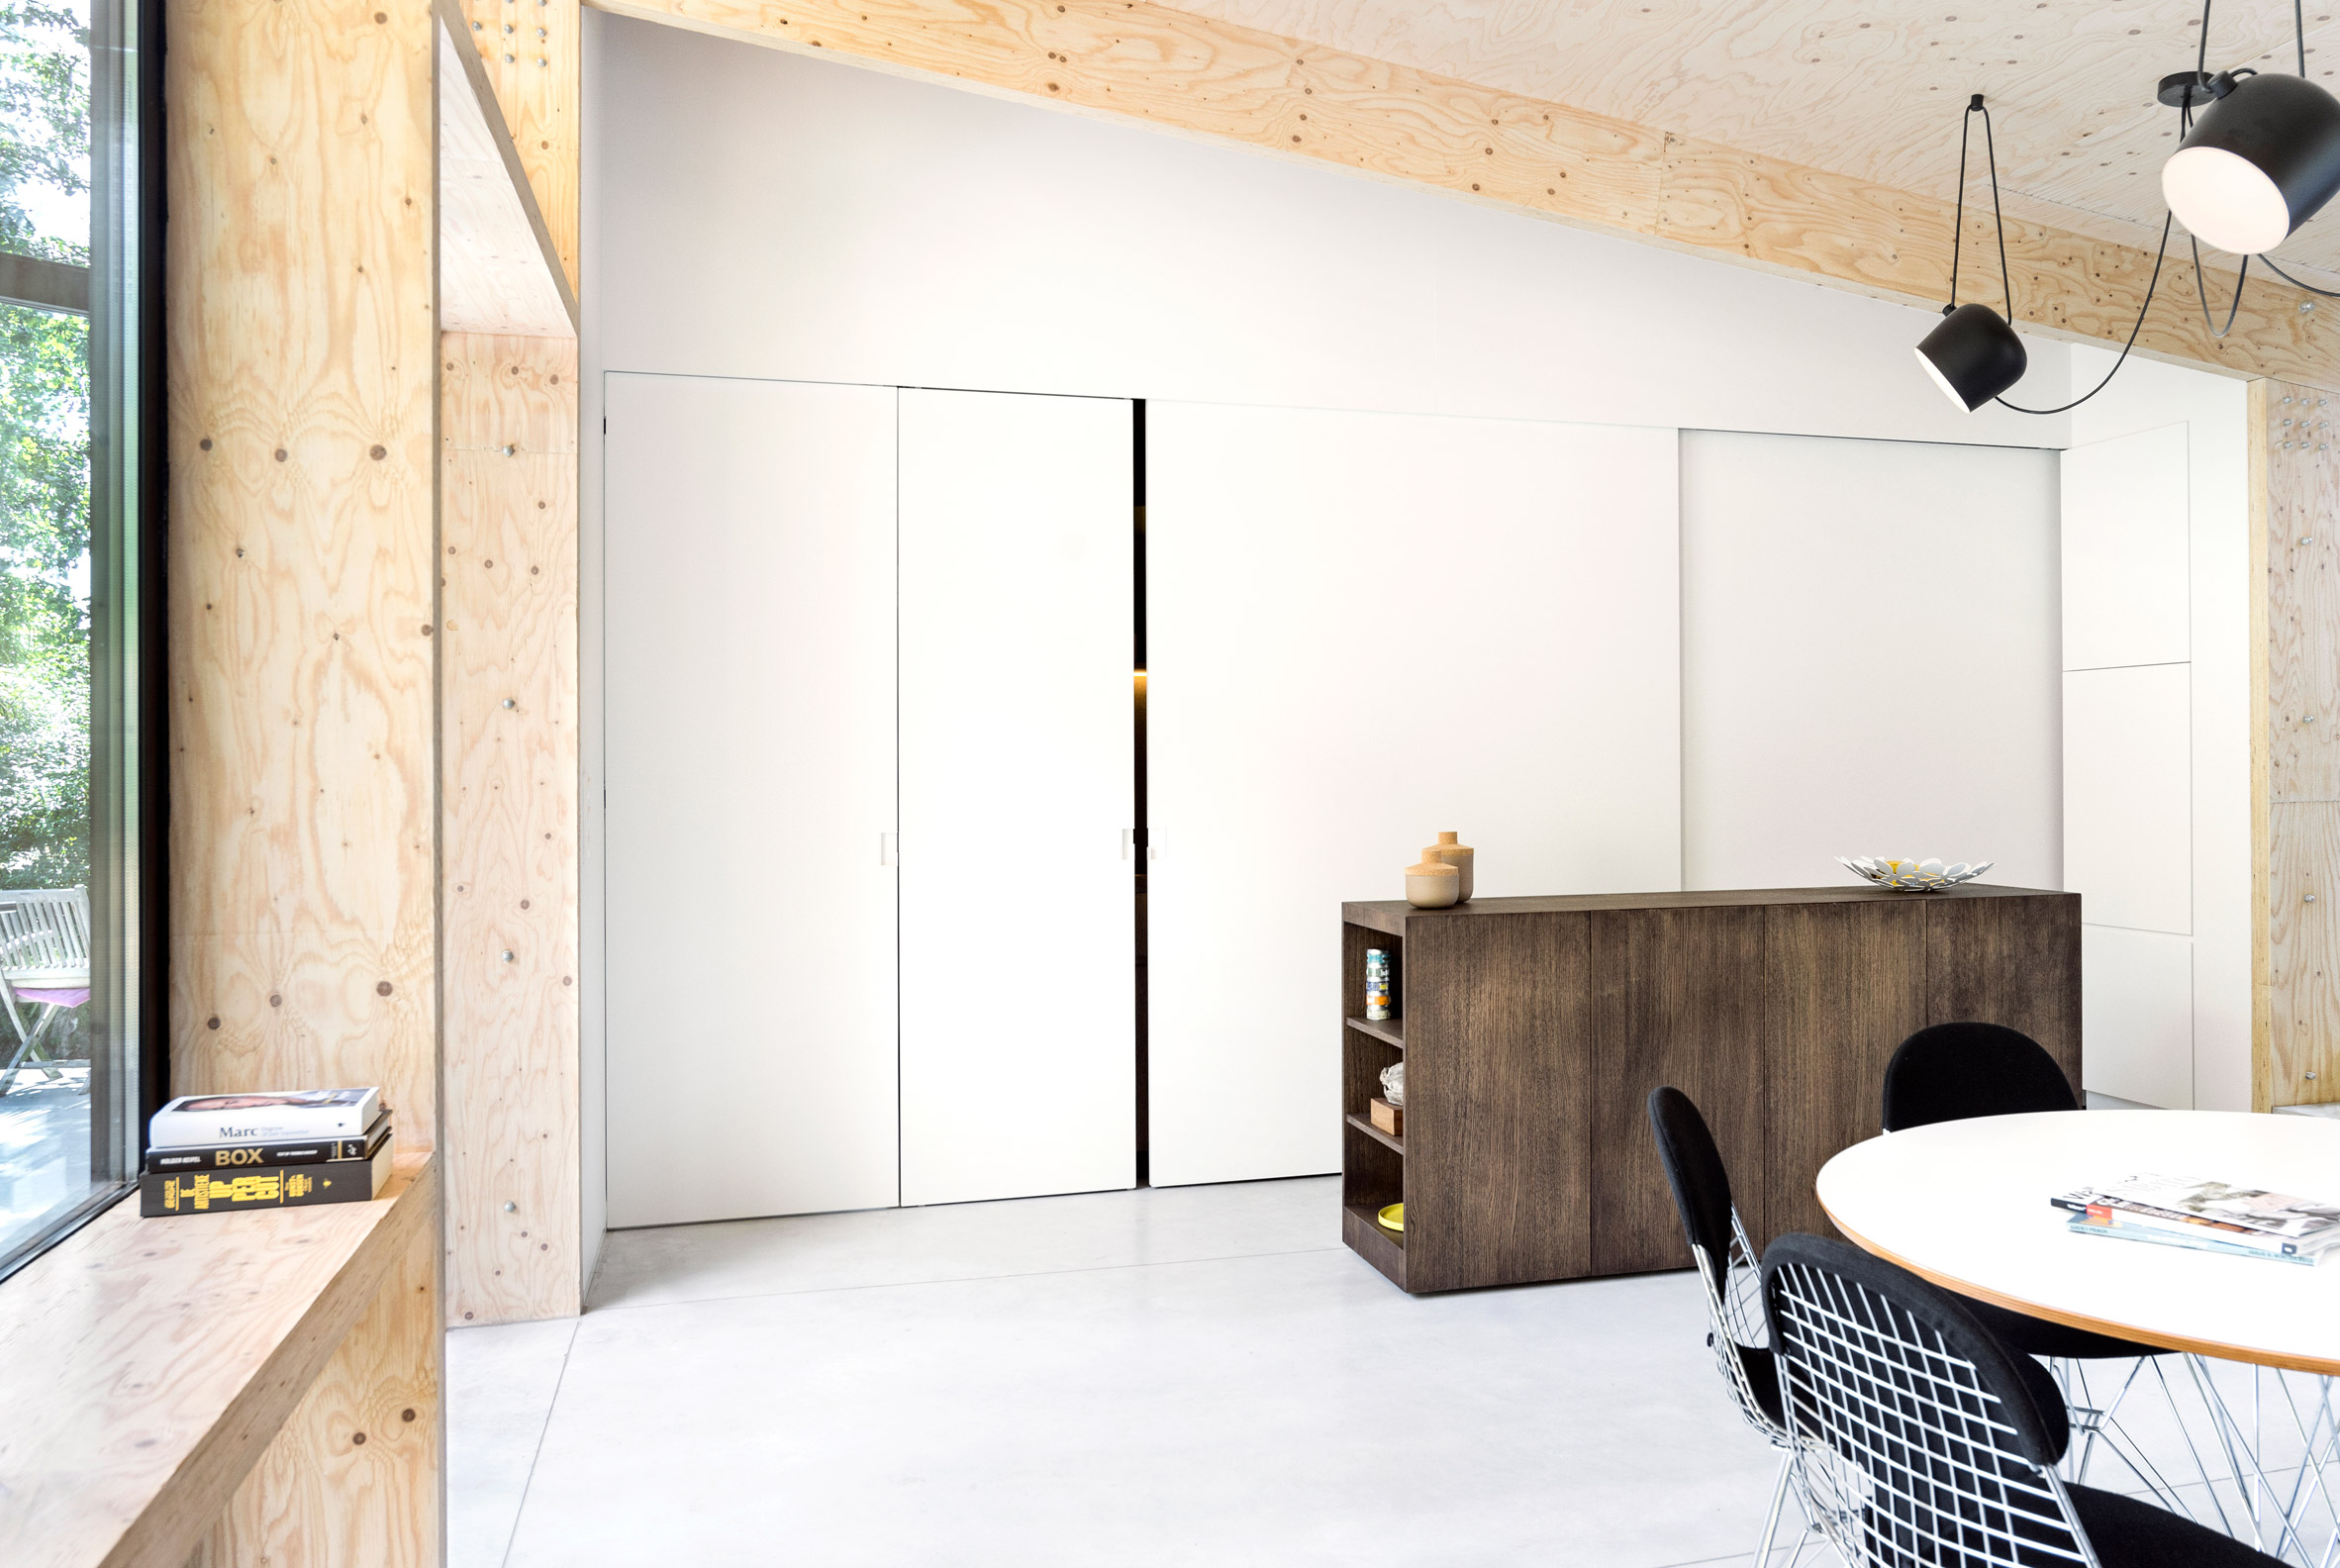 architecture-semi-detached-house-with-an-outdoor-areadesign-studia-interiors-osnovadesign-osnova-poltava_12